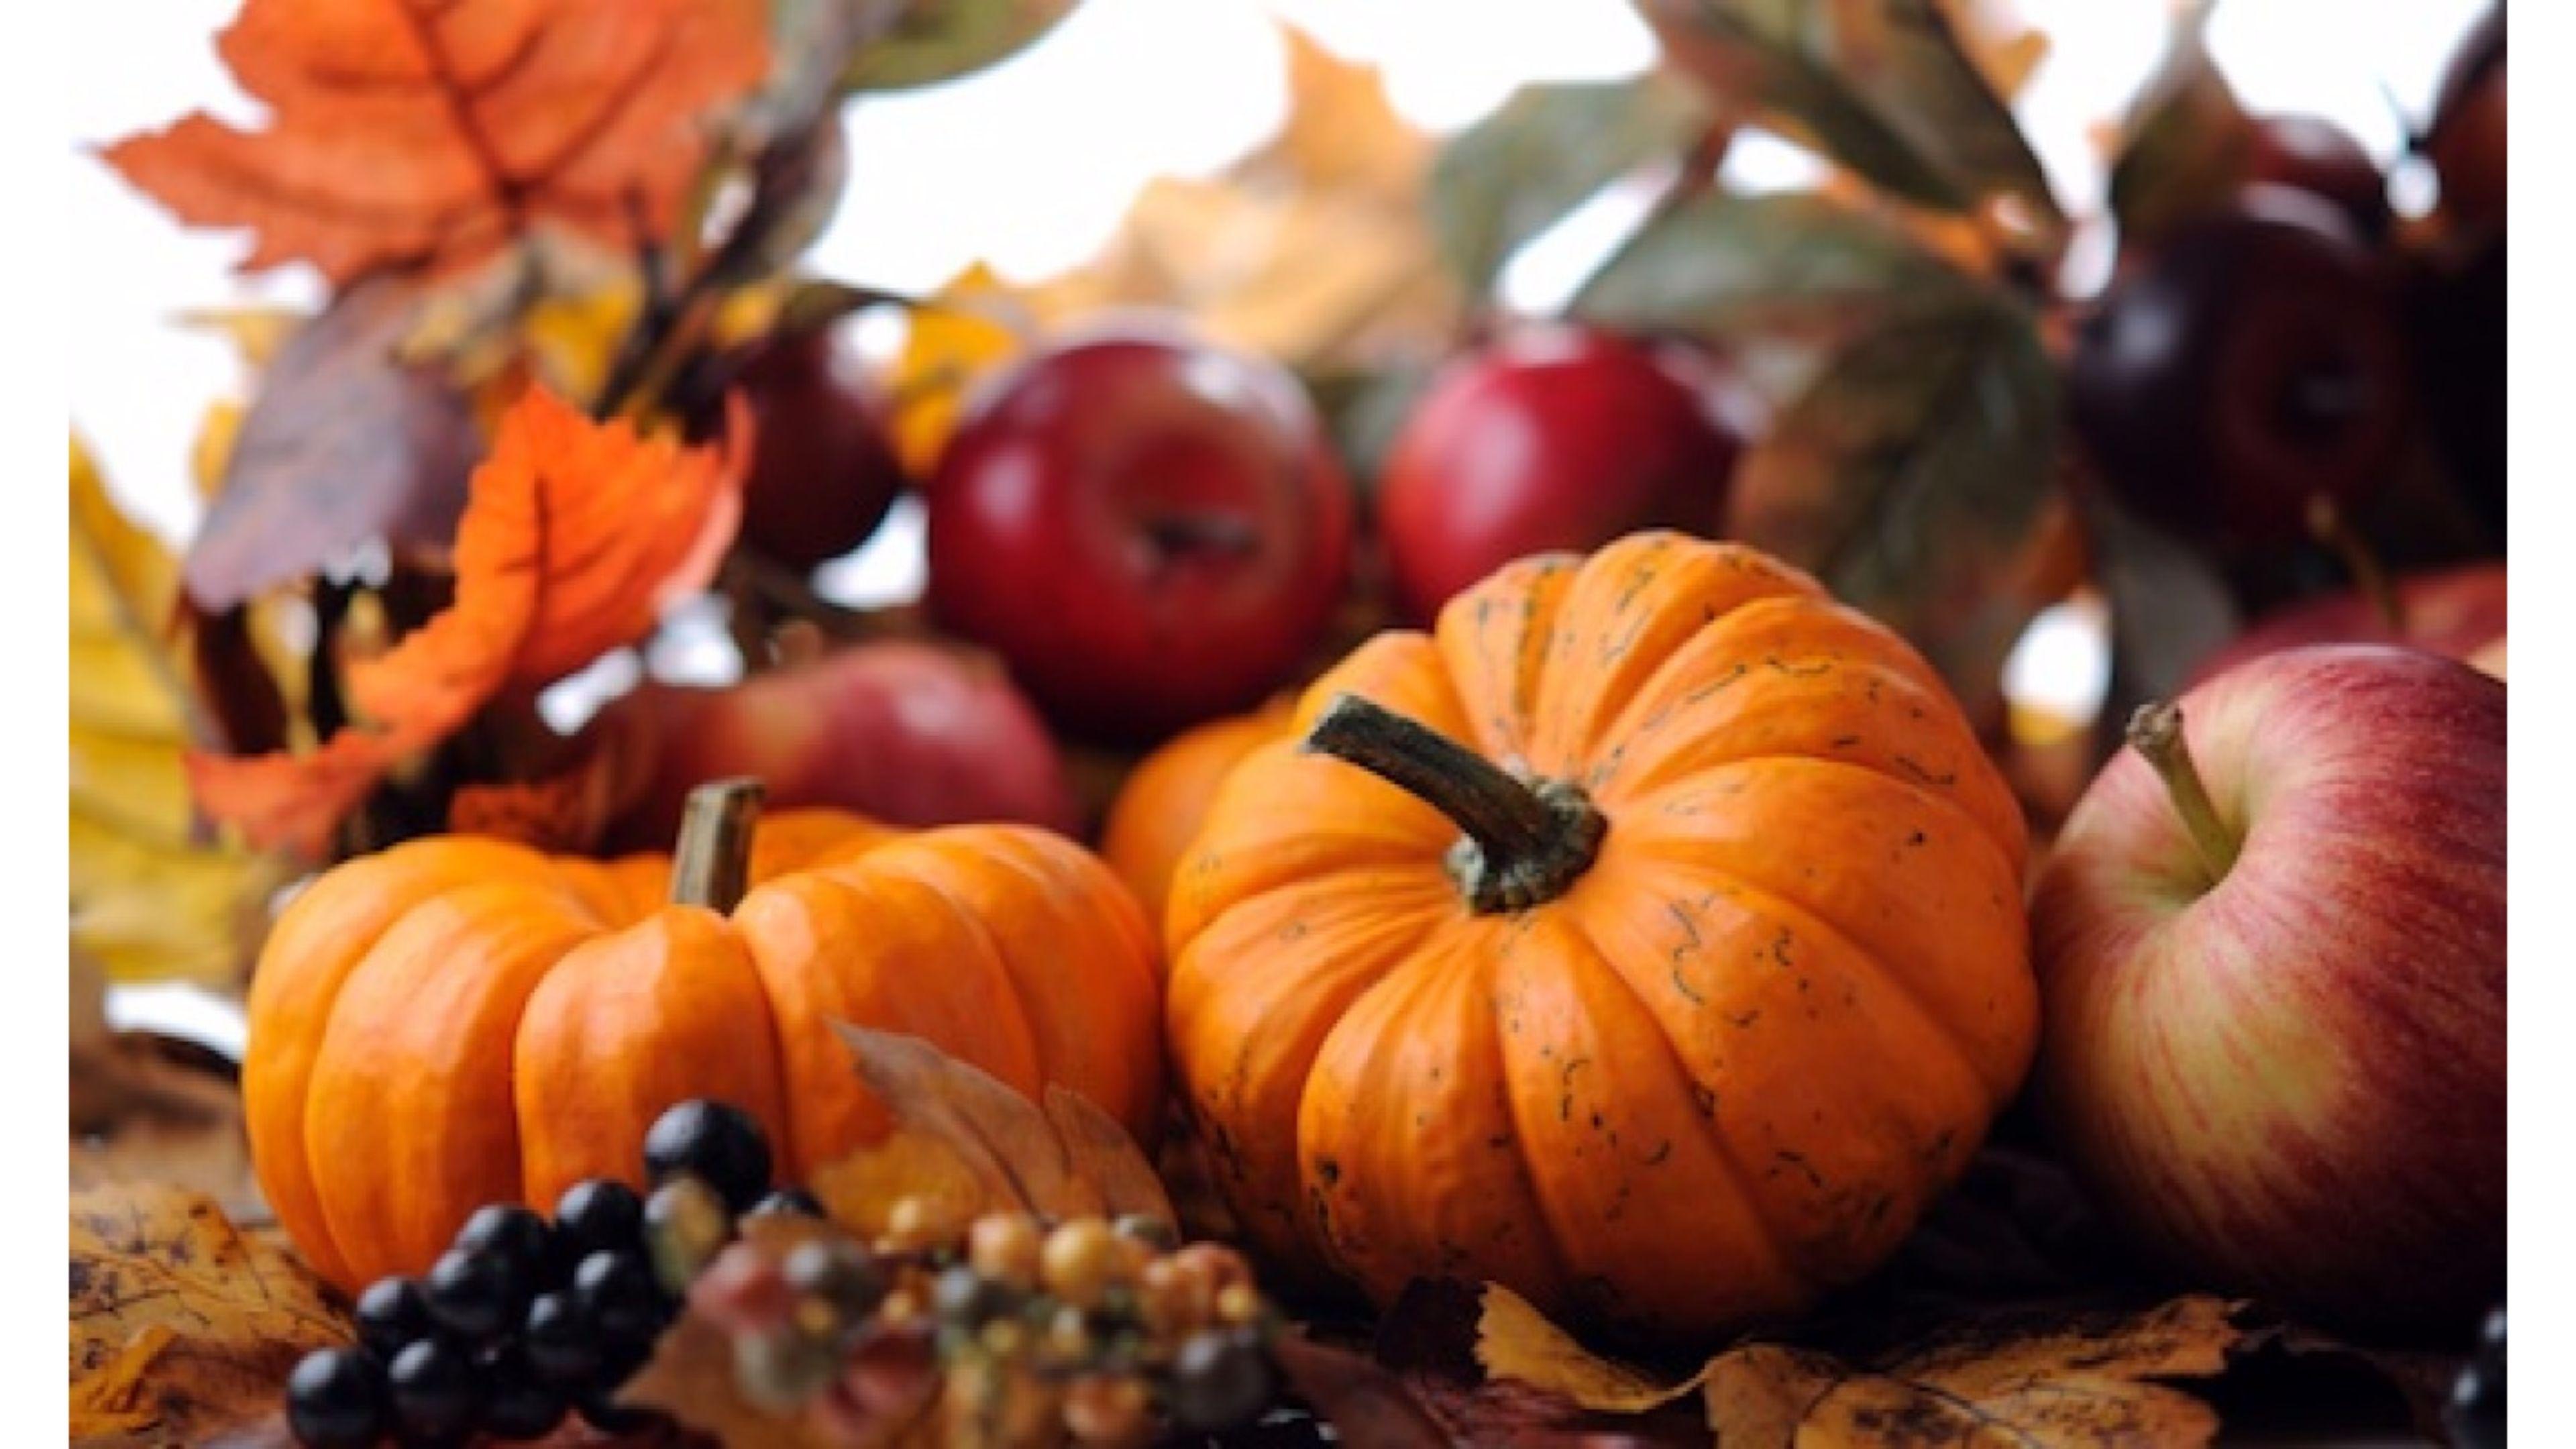 pumpkin and fruit 4k fall wallpaper | free 4k wallpaper